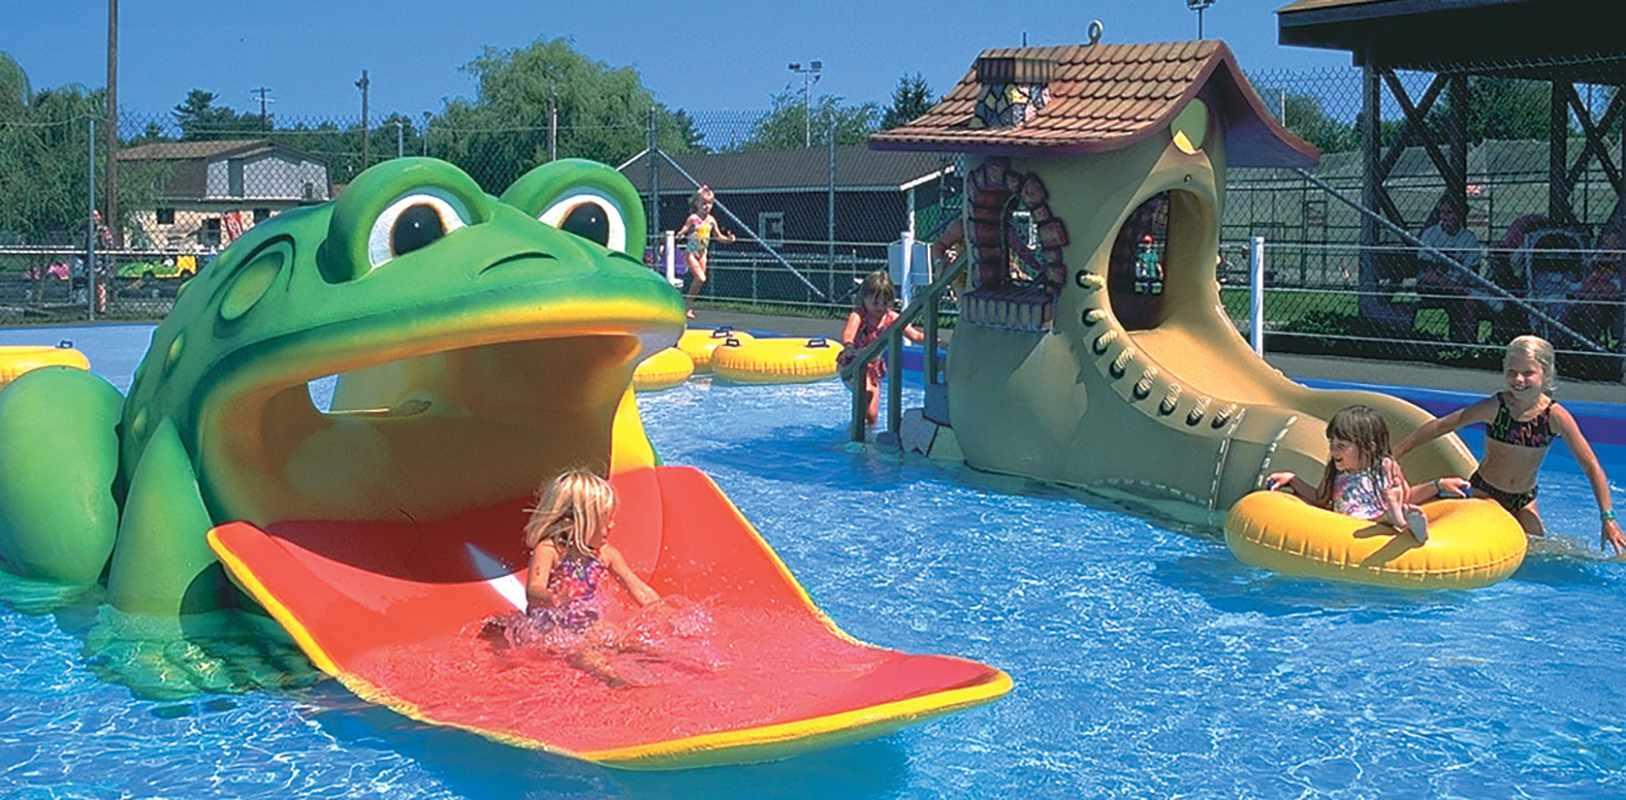 Carousel Water & Fun Park Pennsylvania